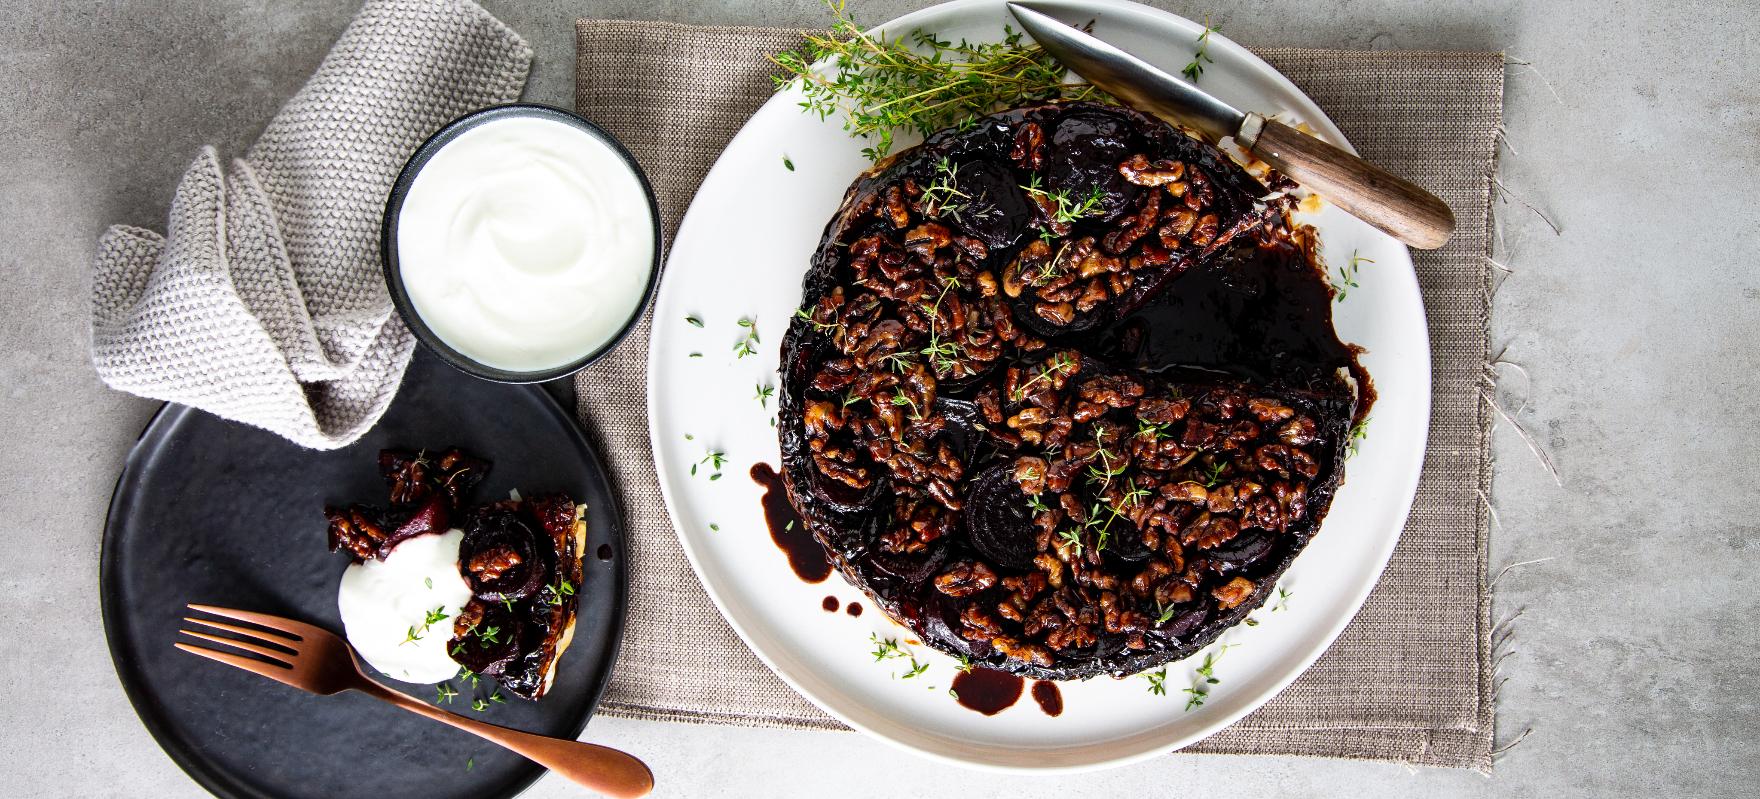 Beetroot & Marmite tart tatin image 2